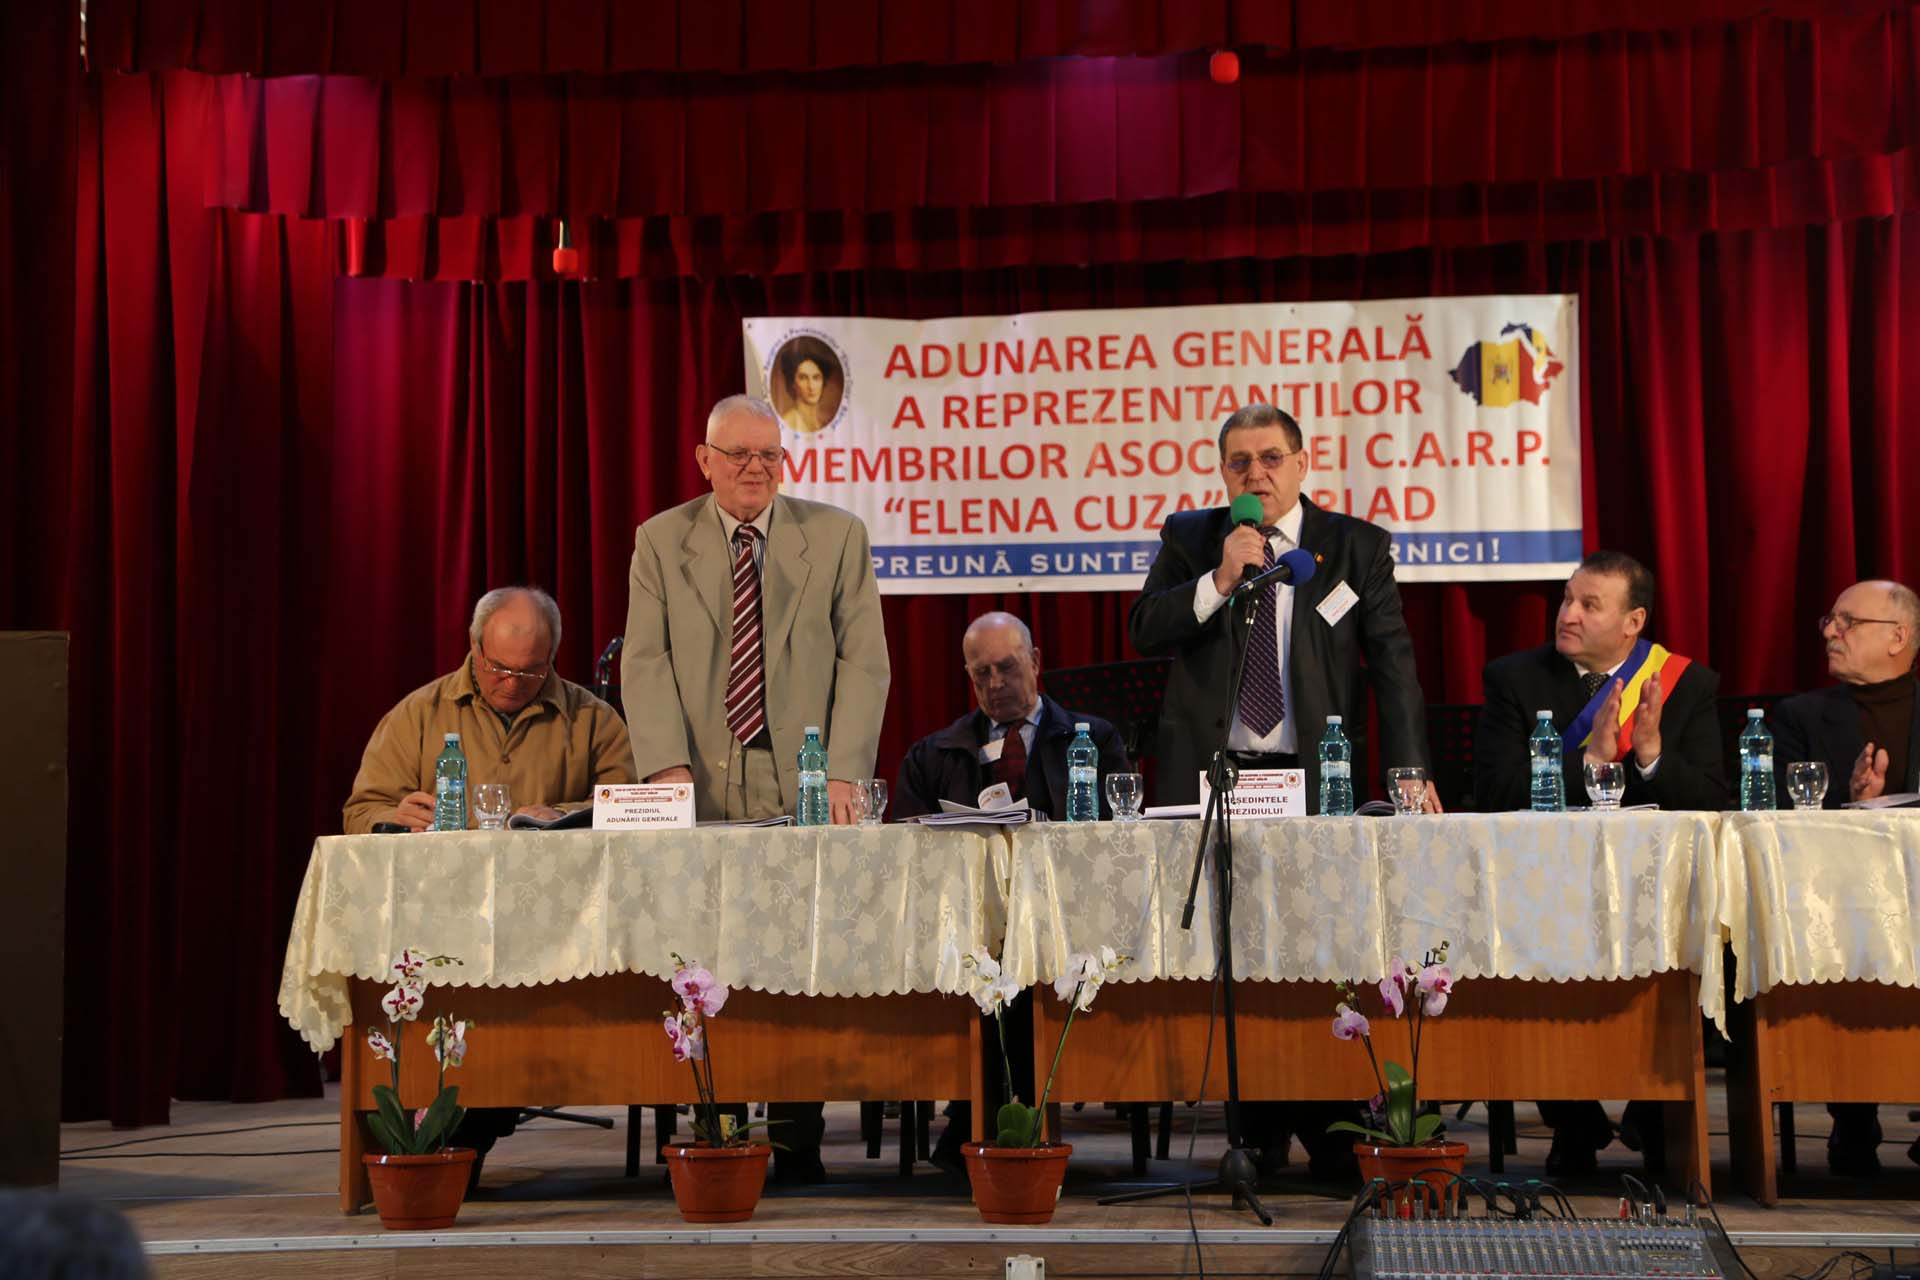 Adunarea generala anuala 2015